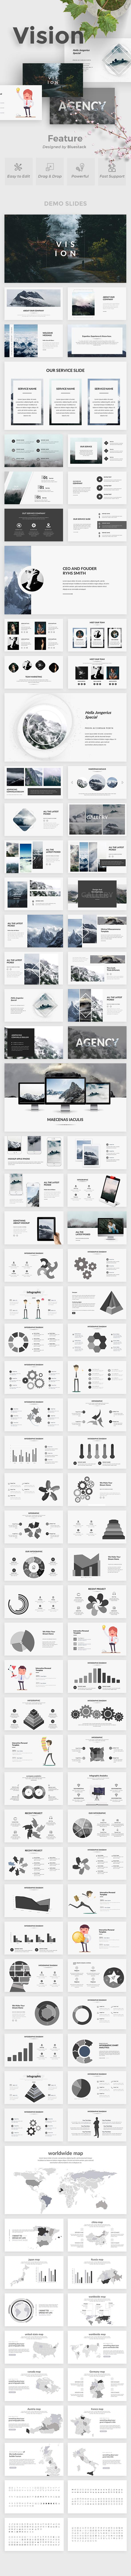 Vision Creative Keynote Template - Creative Keynote Templates